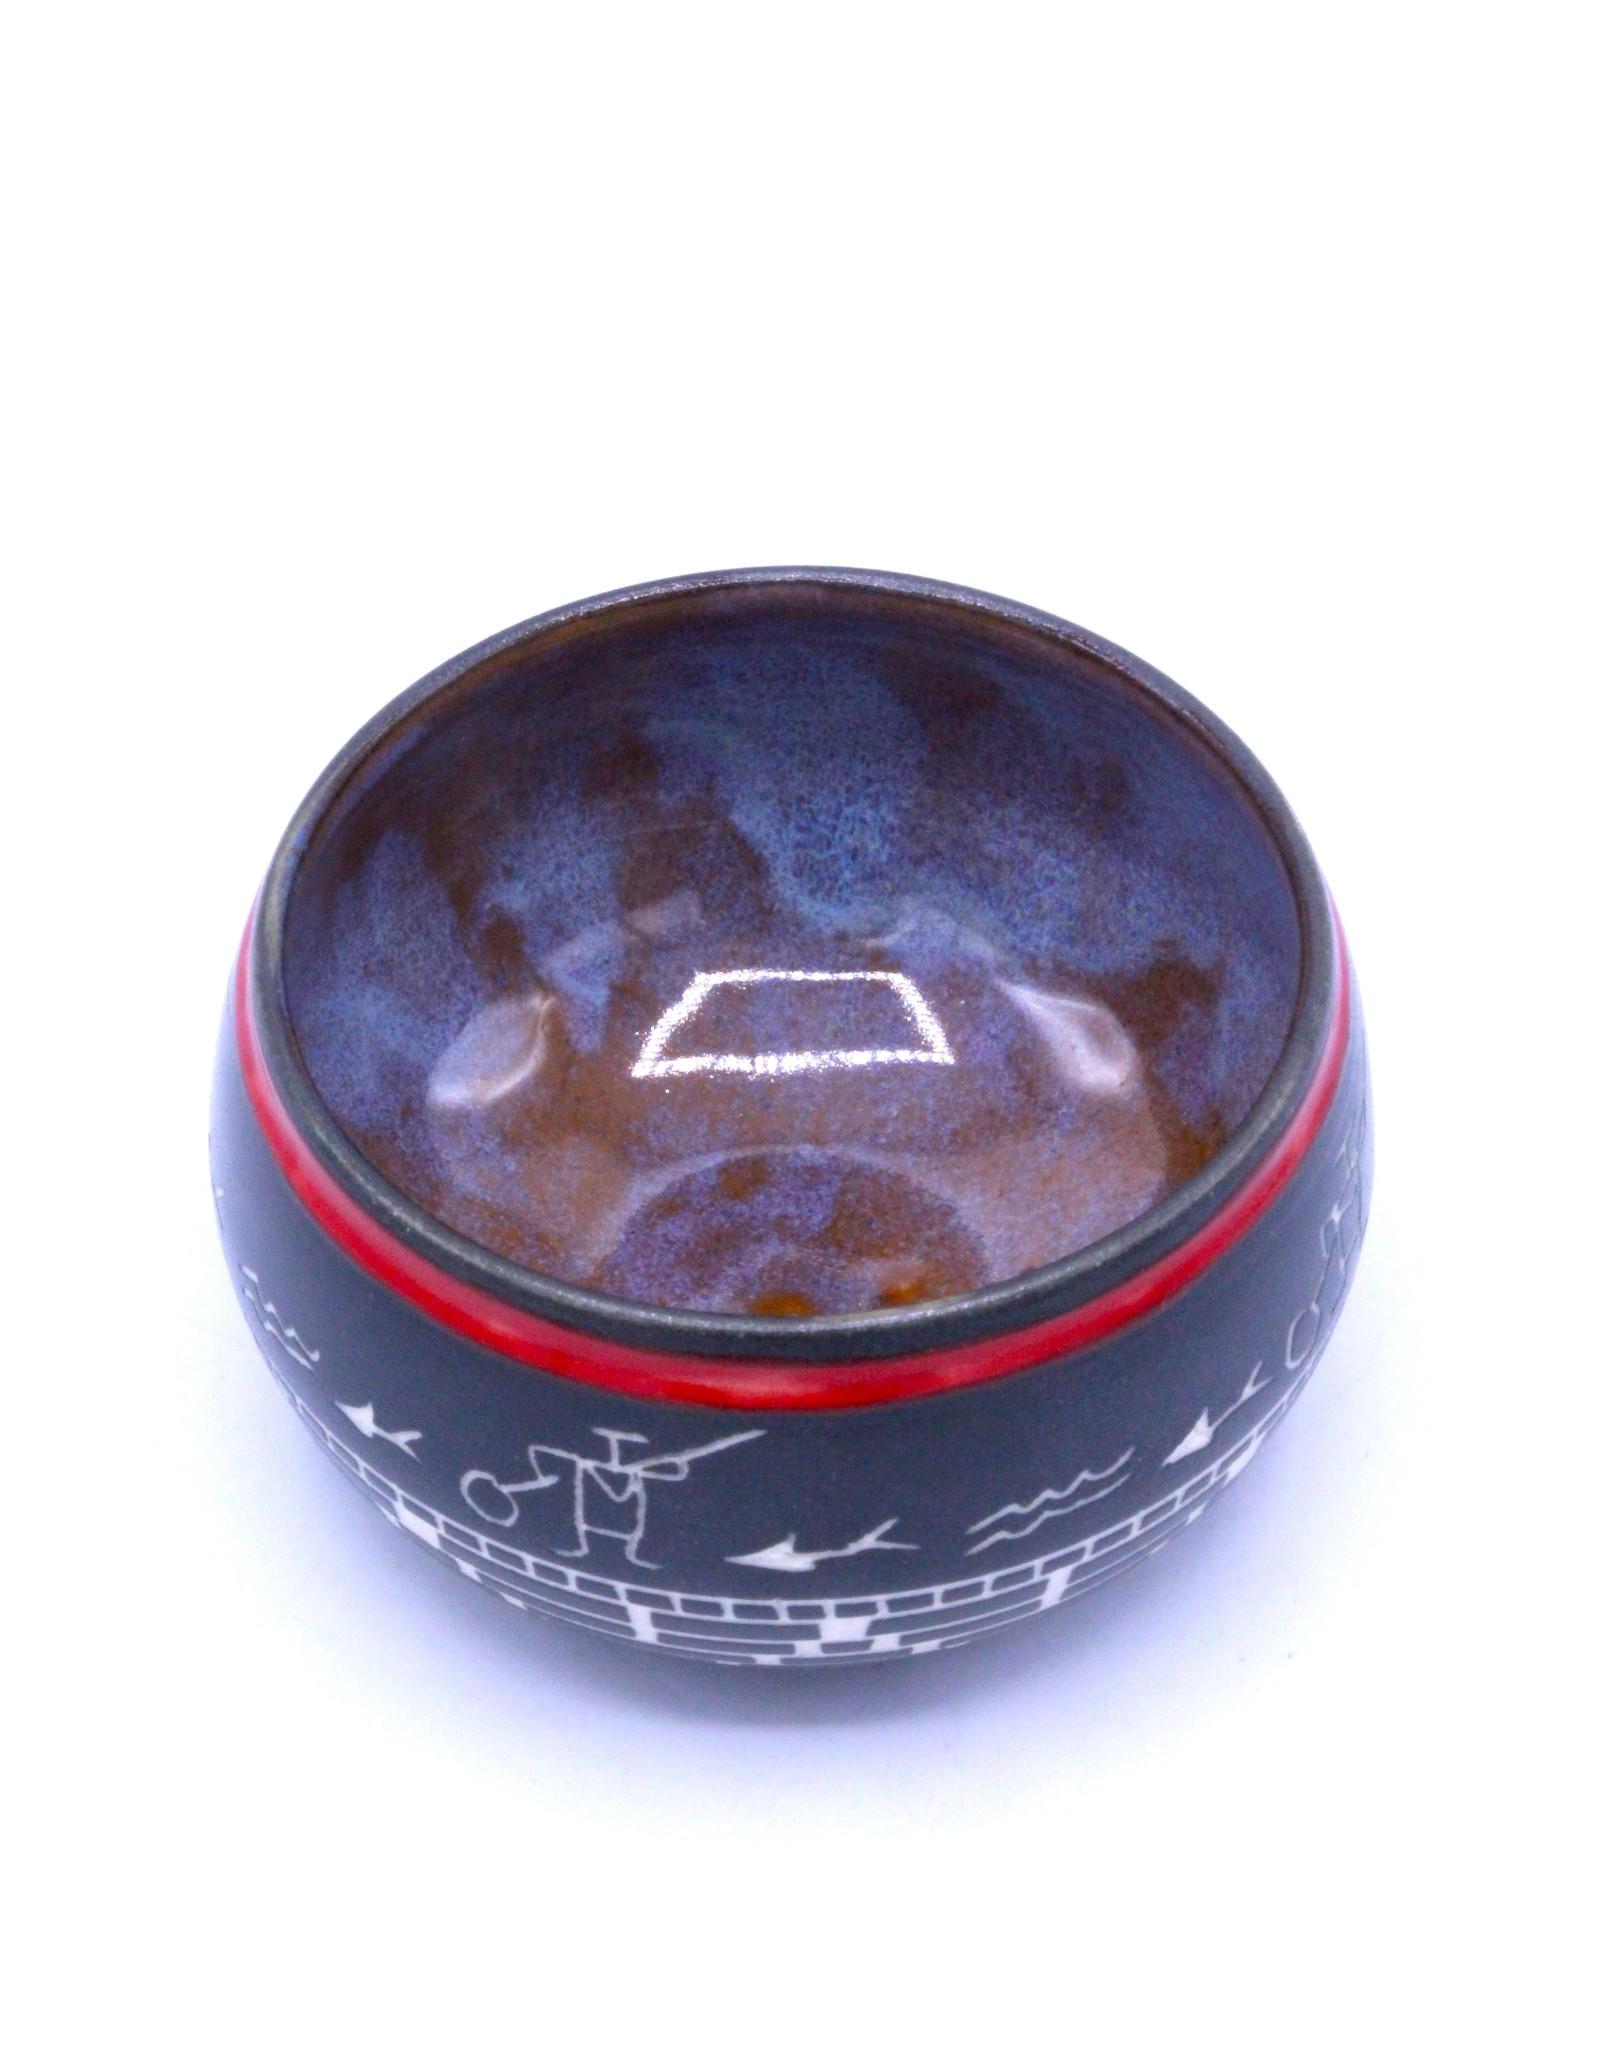 Pottery - #0058